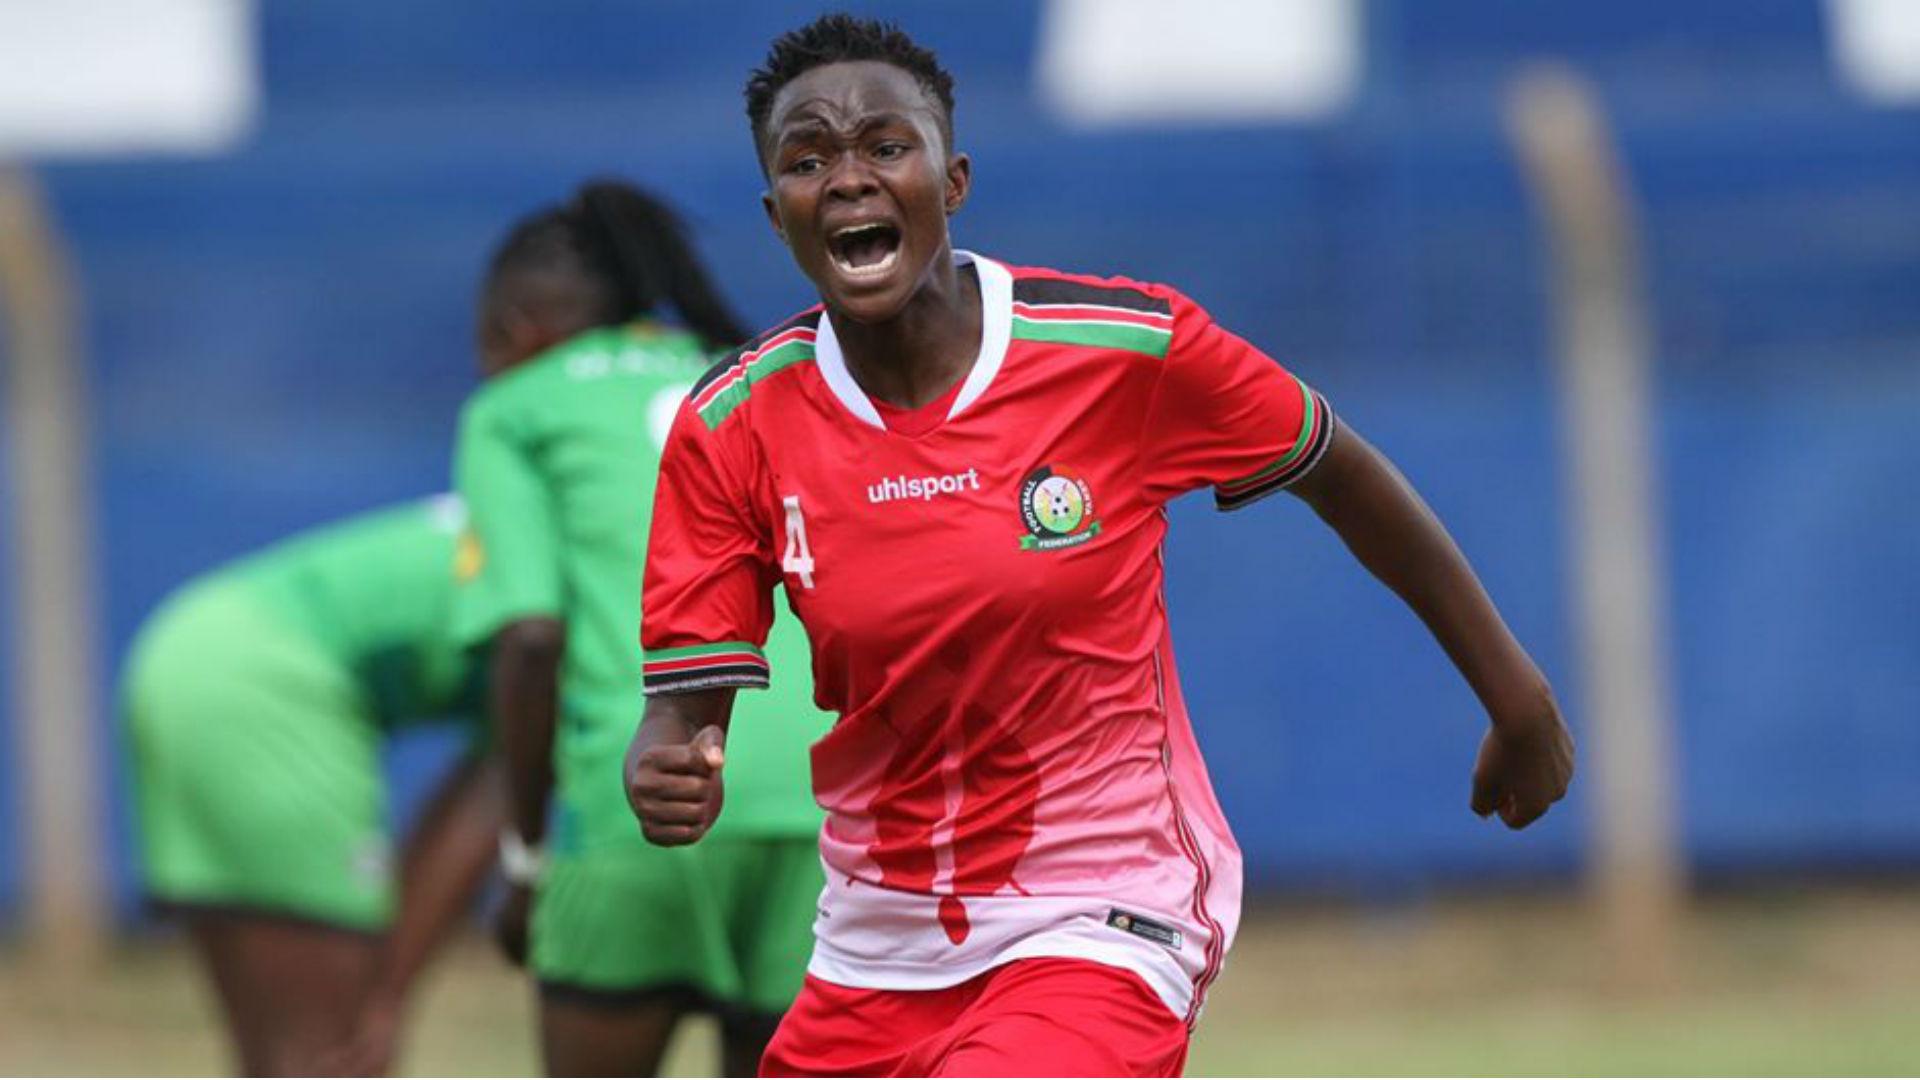 Reaching Oshoala's heights my ultimate dream – Kenya's Shilwatso